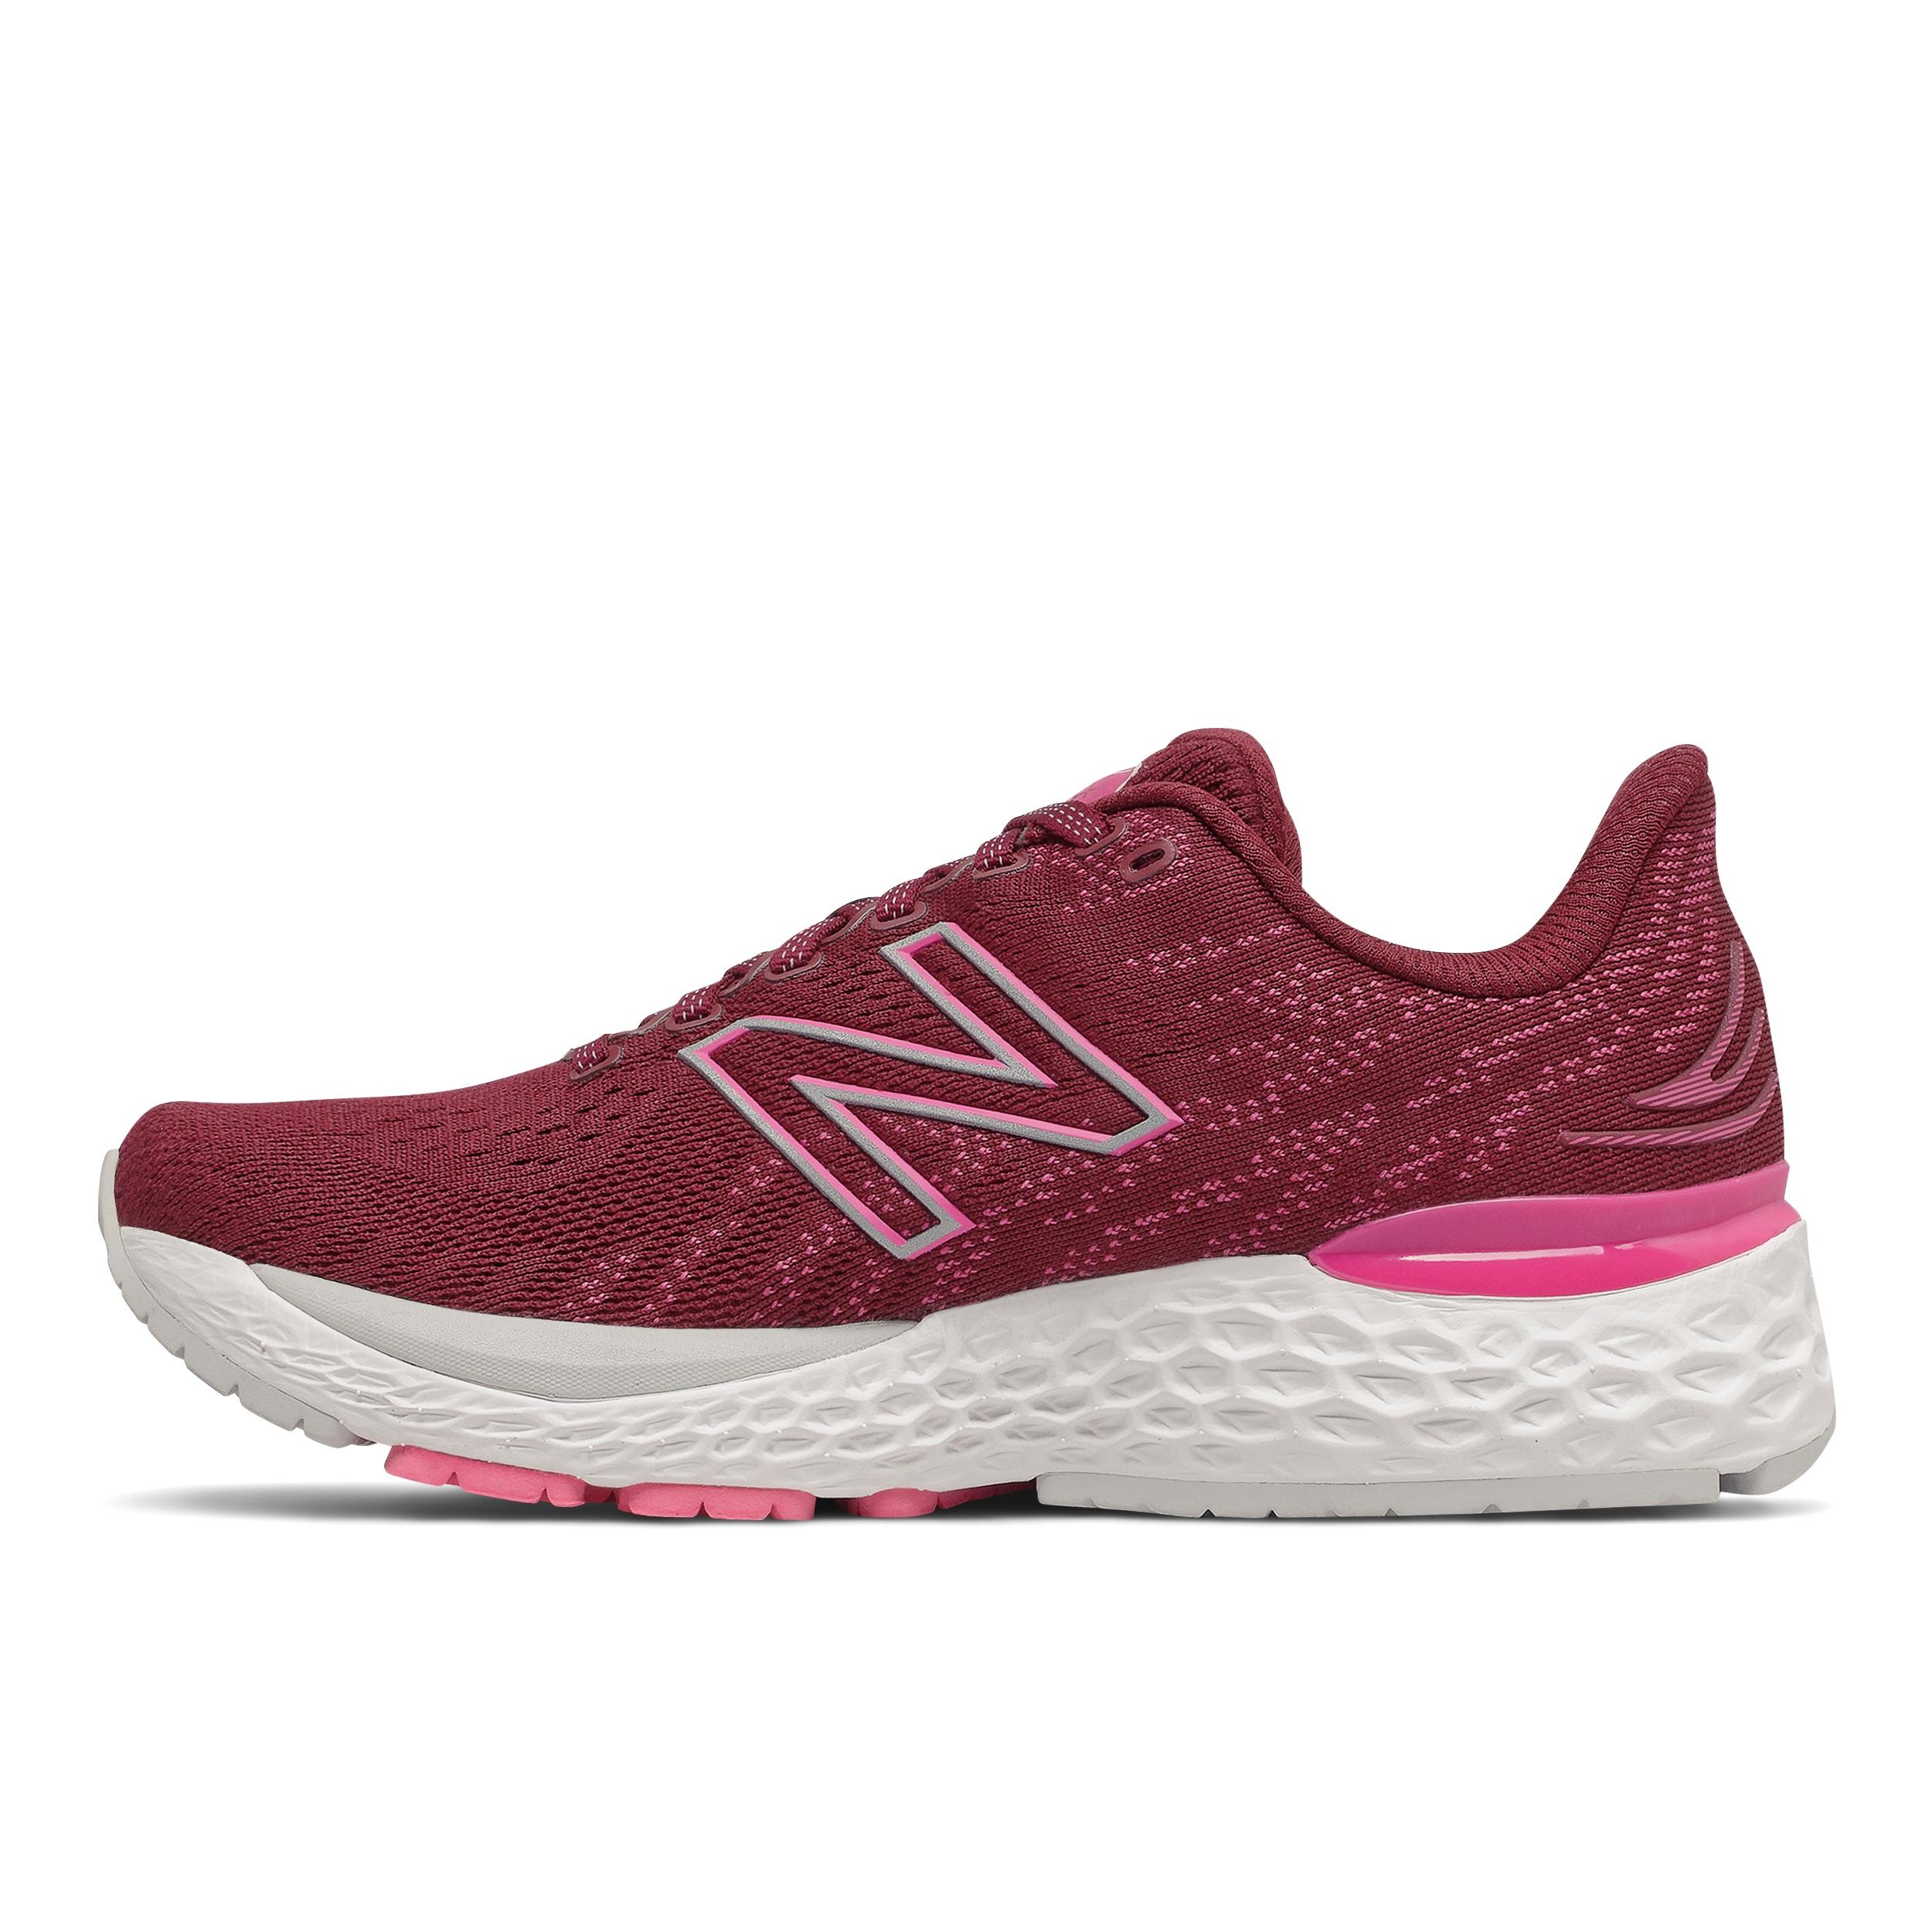 Women's New Balance 880V11 Running Shoe - Color: Garnet/Pink Glo - Size: 5 - Width: Narrow, Garnet/Pink Glo, large, image 2